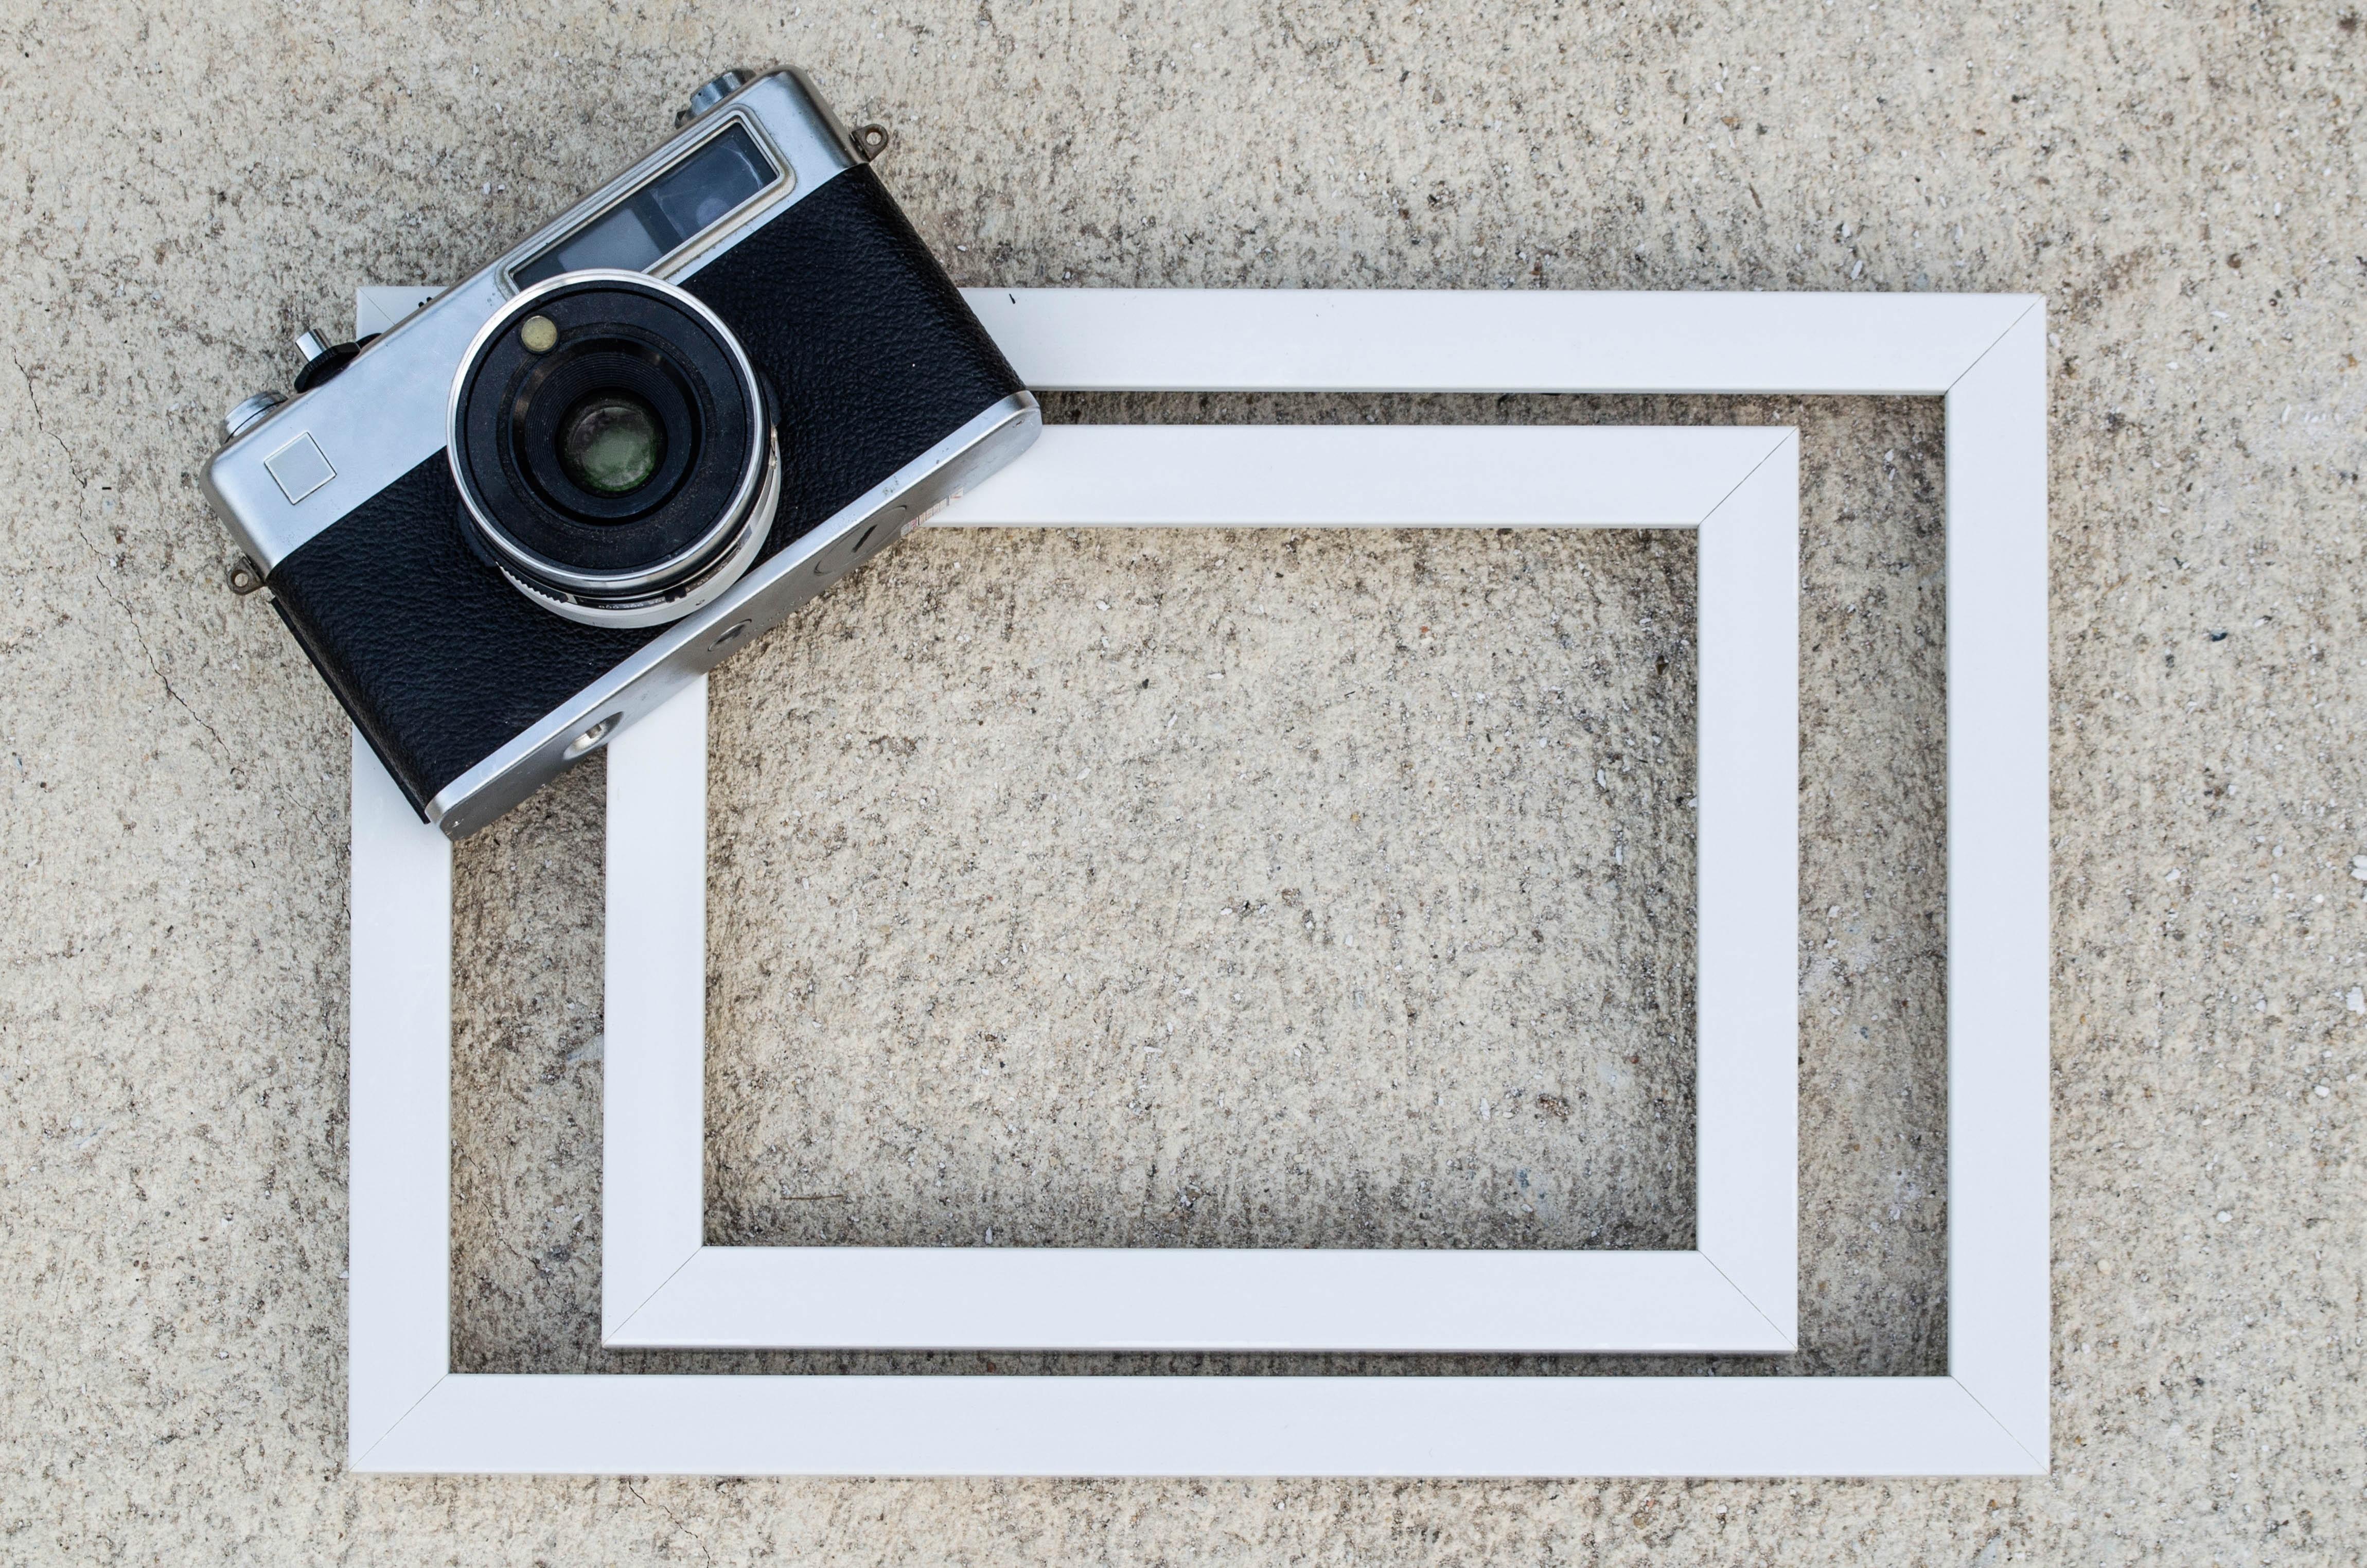 Free Images : vintage, retro, photo, lens, film camera, empty, old ...